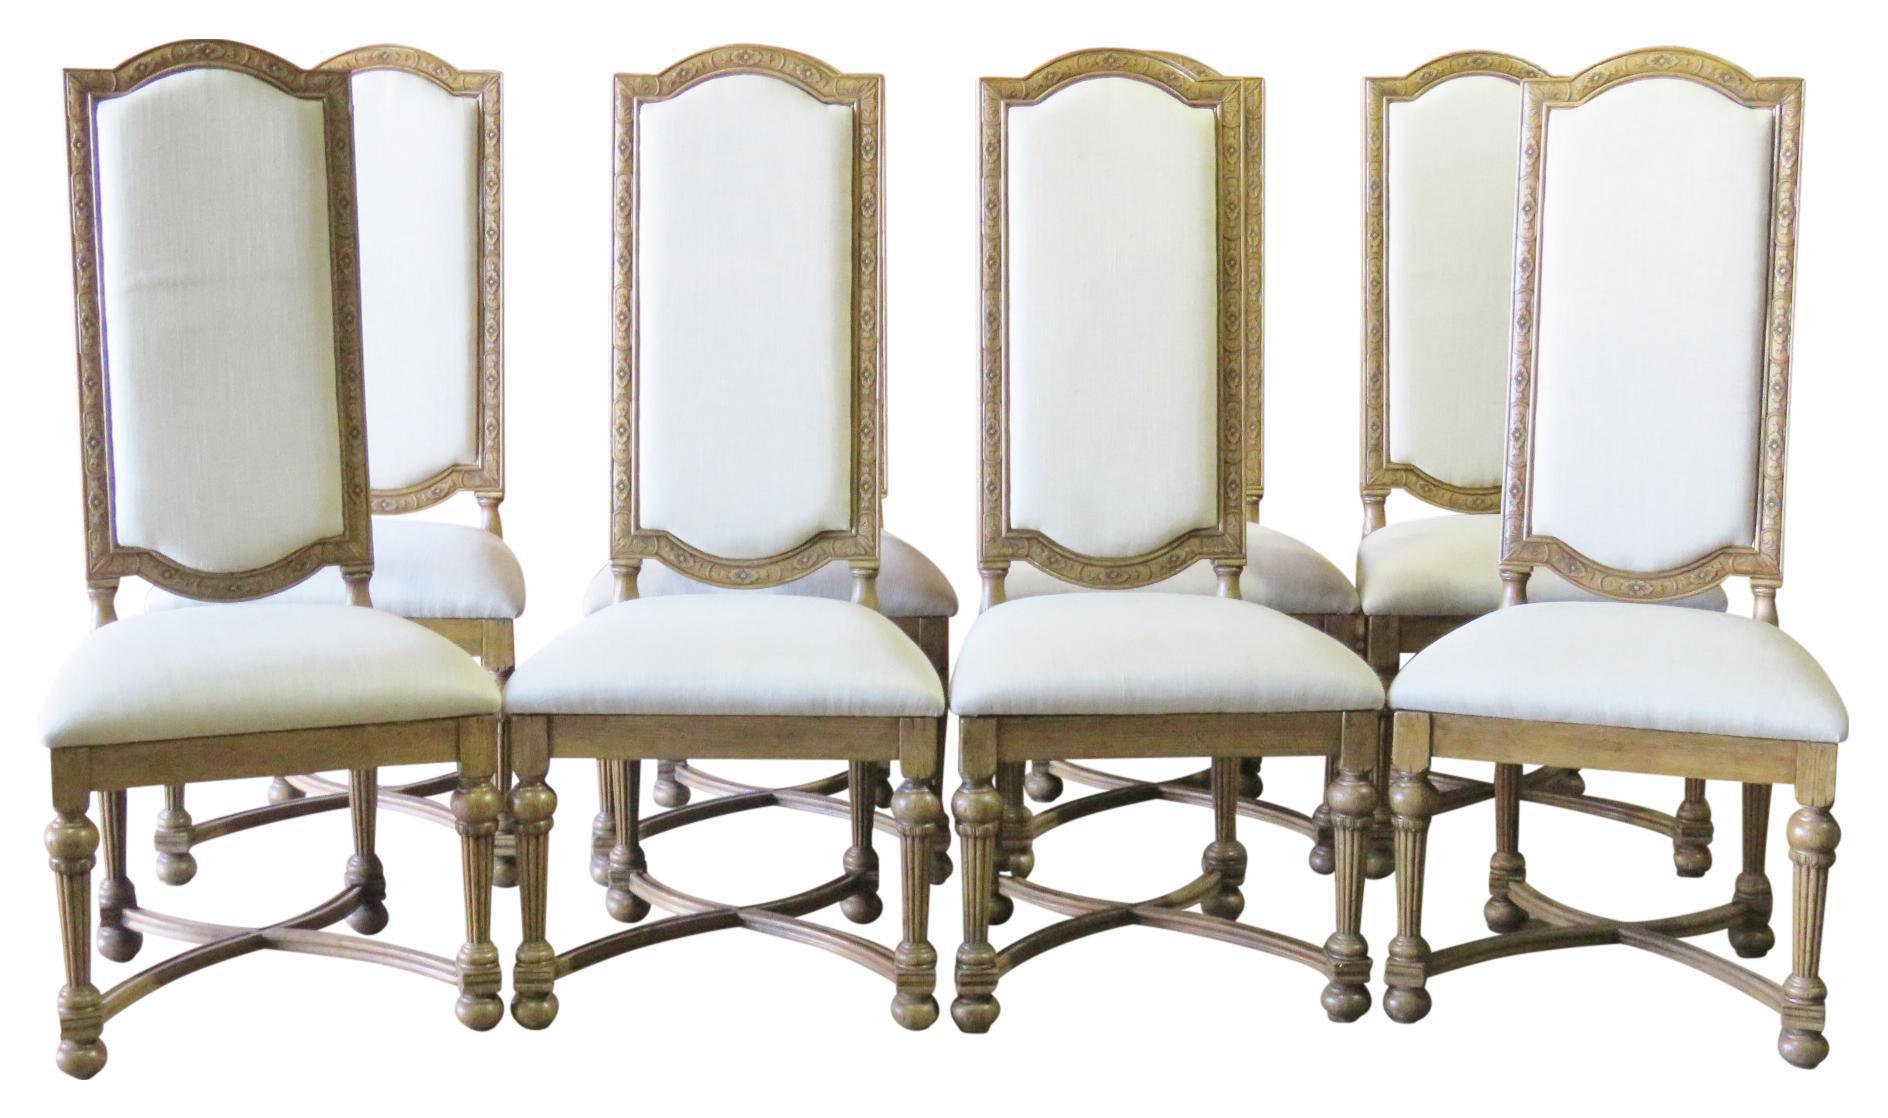 jonathan charles highback dining chairs set of 8